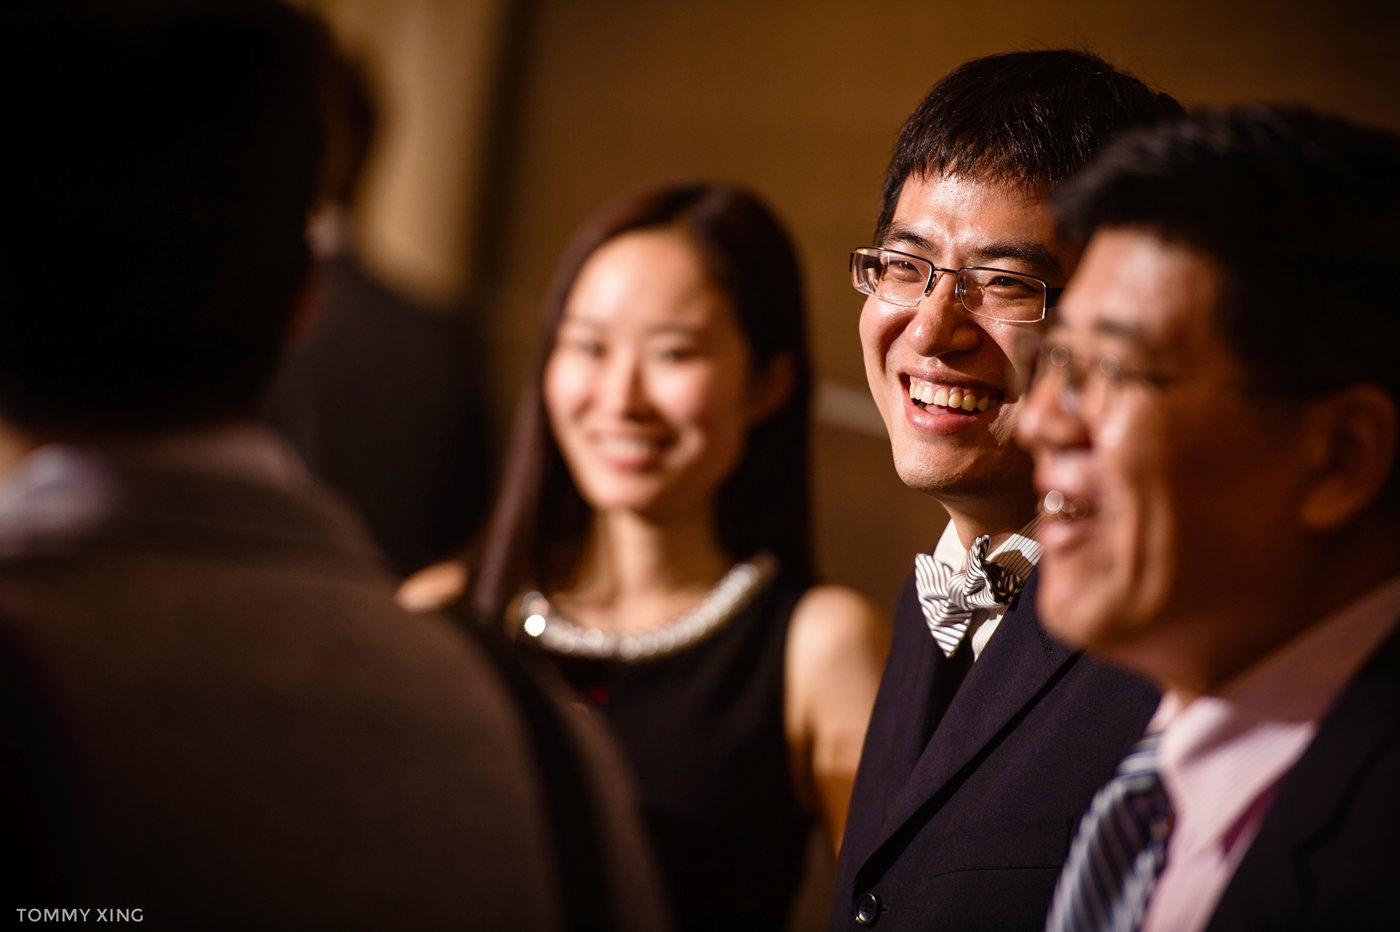 STANFORD MEMORIAL CHURCH WEDDING - Wenjie & Chengcheng - SAN FRANCISCO BAY AREA 斯坦福教堂婚礼跟拍 - 洛杉矶婚礼婚纱照摄影师 Tommy Xing Photography172.jpg